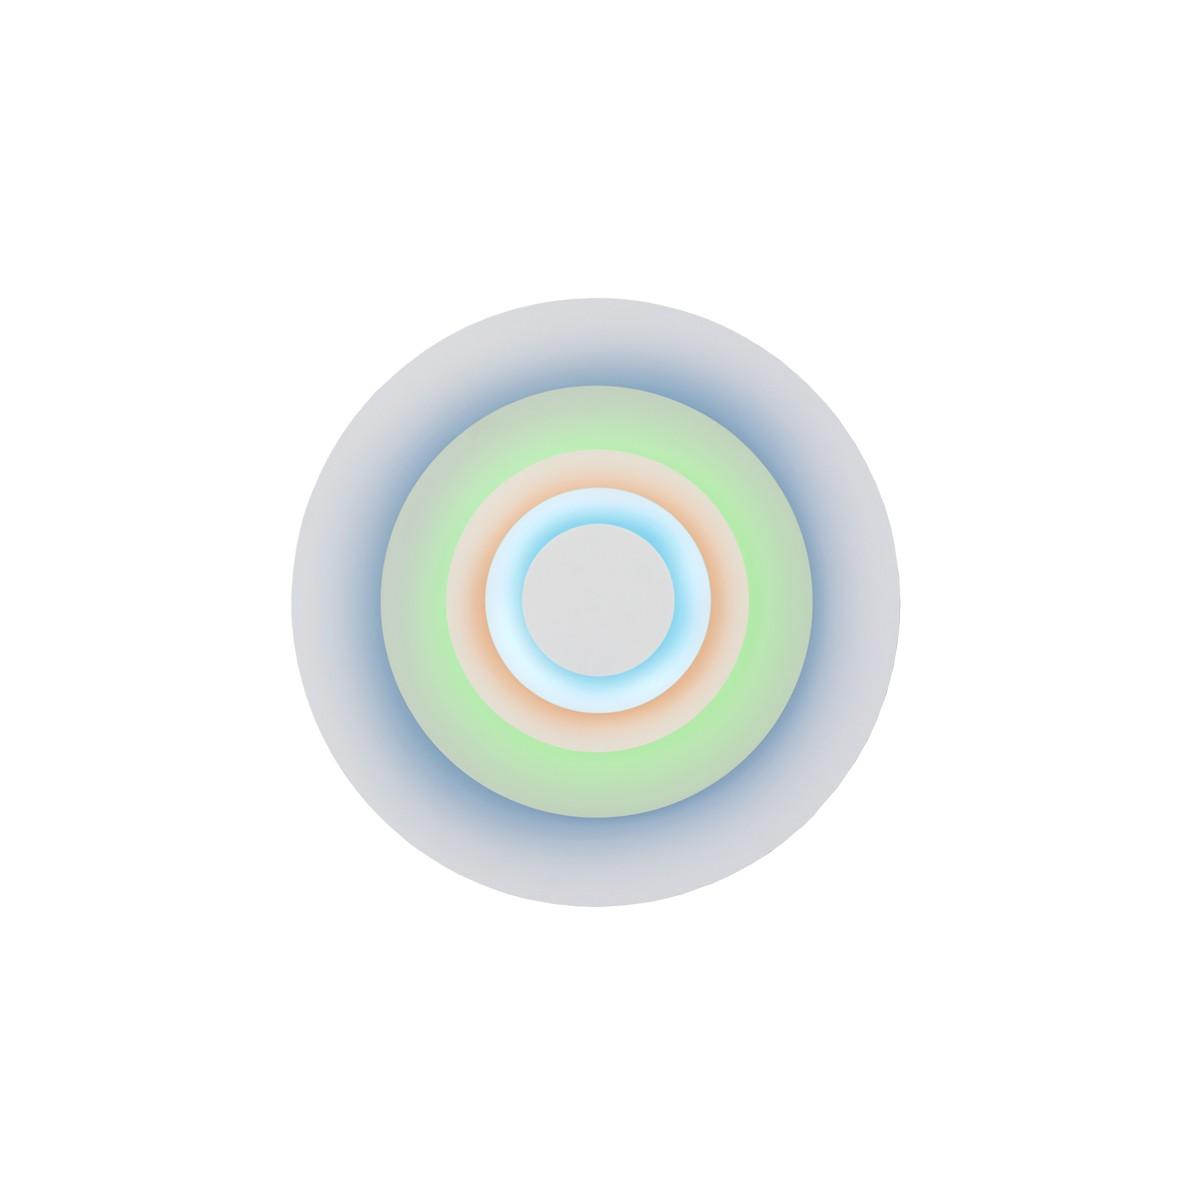 Marset Concentric S LED Wandleuchte, Minor (blau/braun/mint)